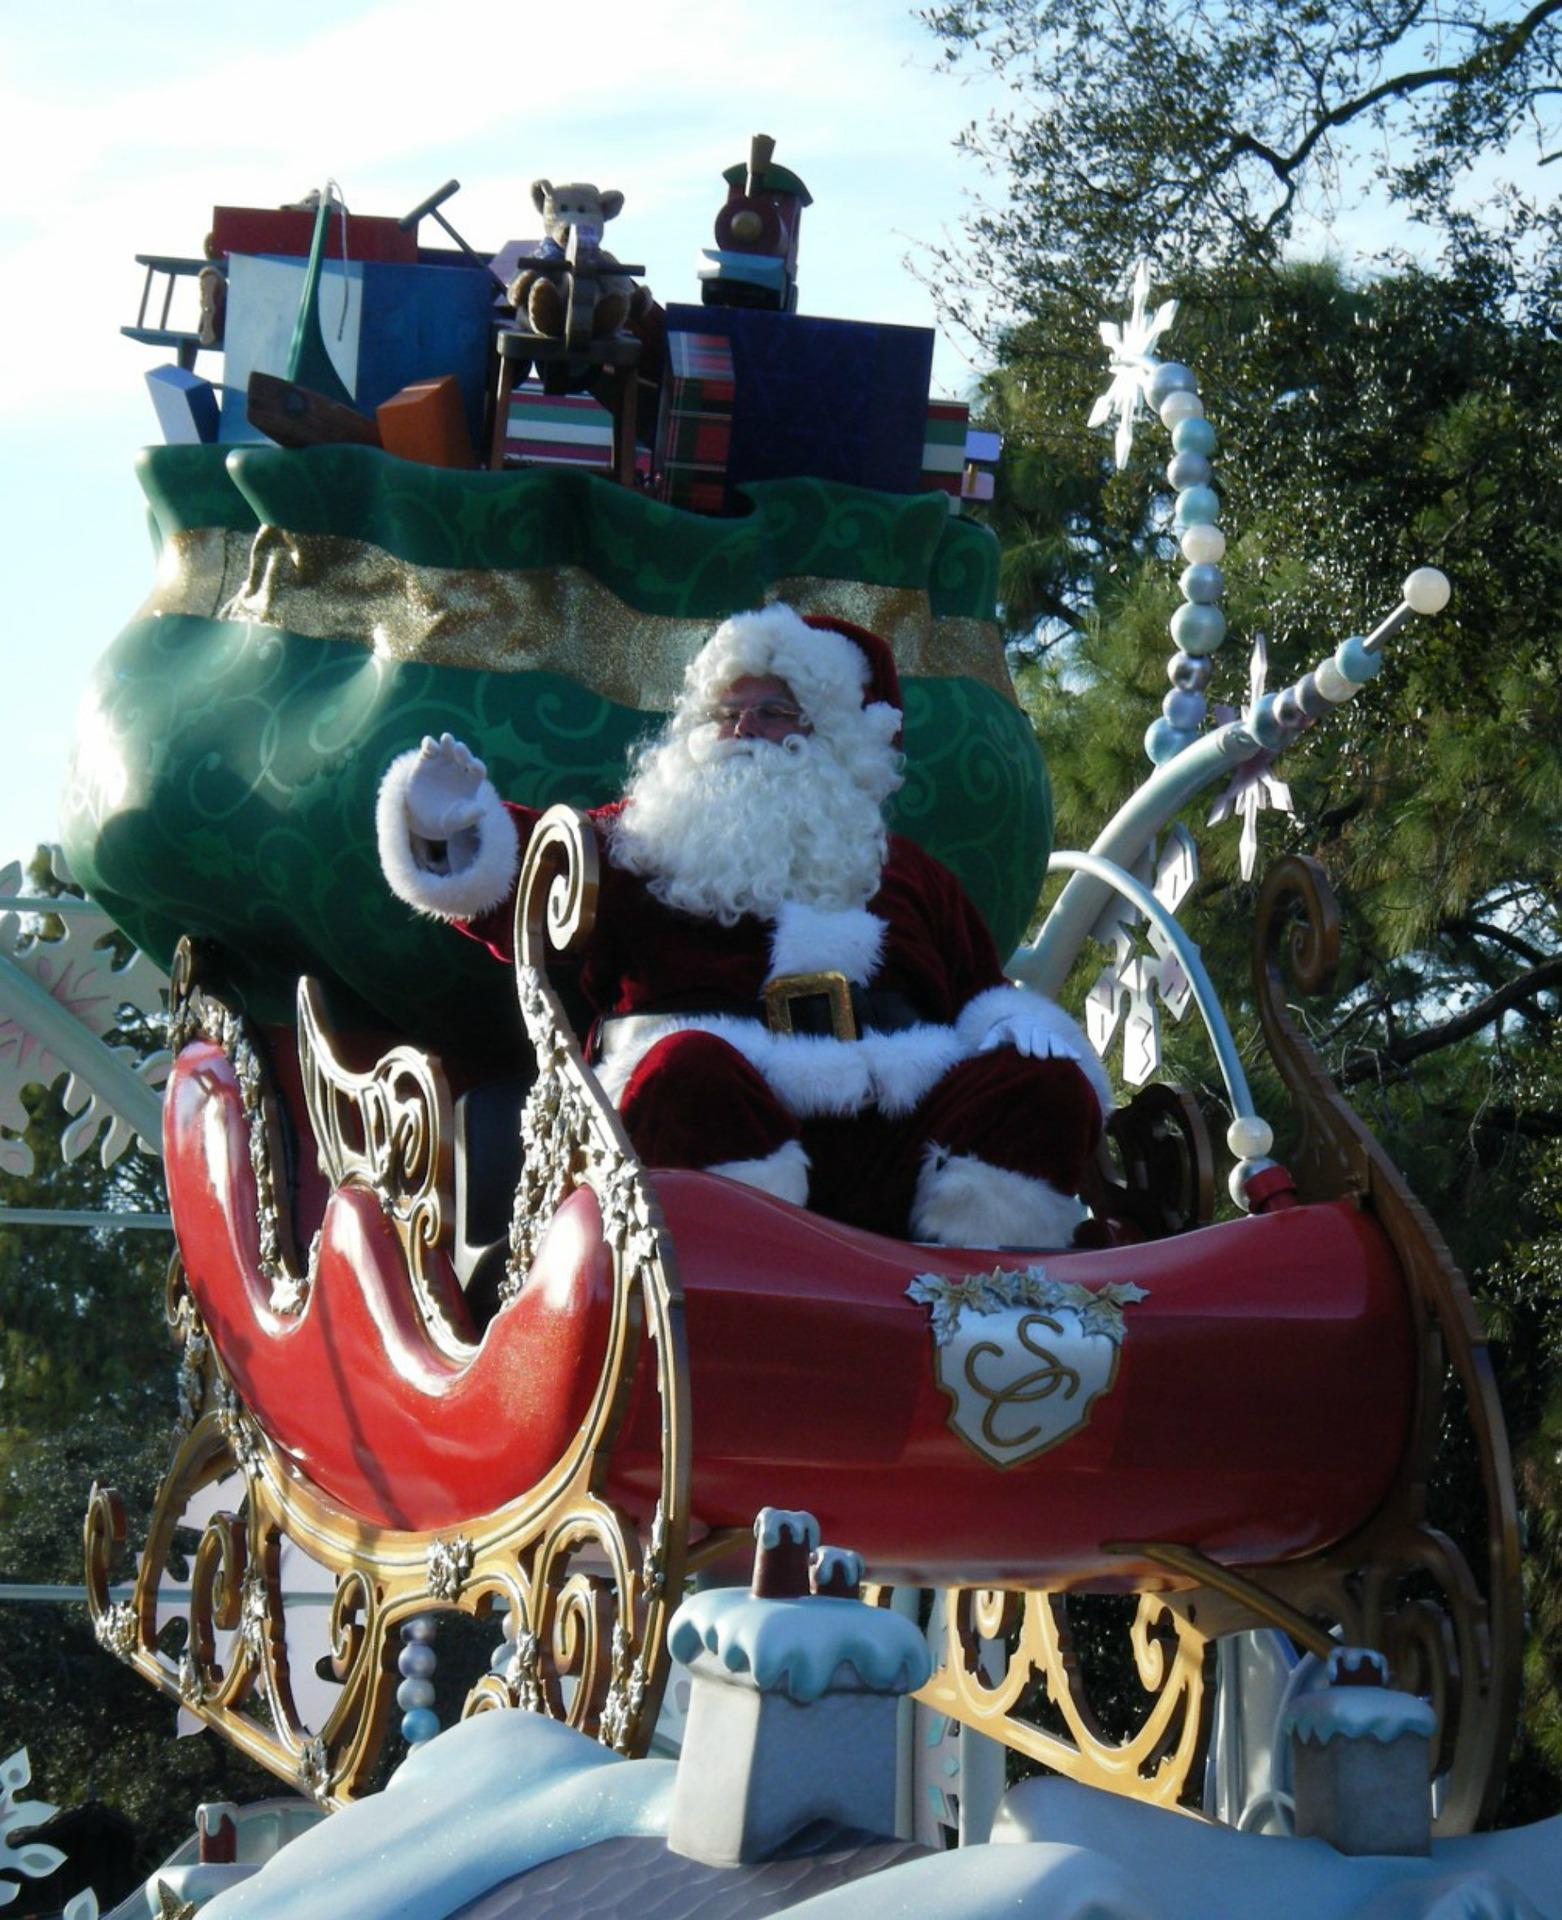 Cary Christmas Parade 2019 Town of Cary Christmas Parade — Cary Jaycees